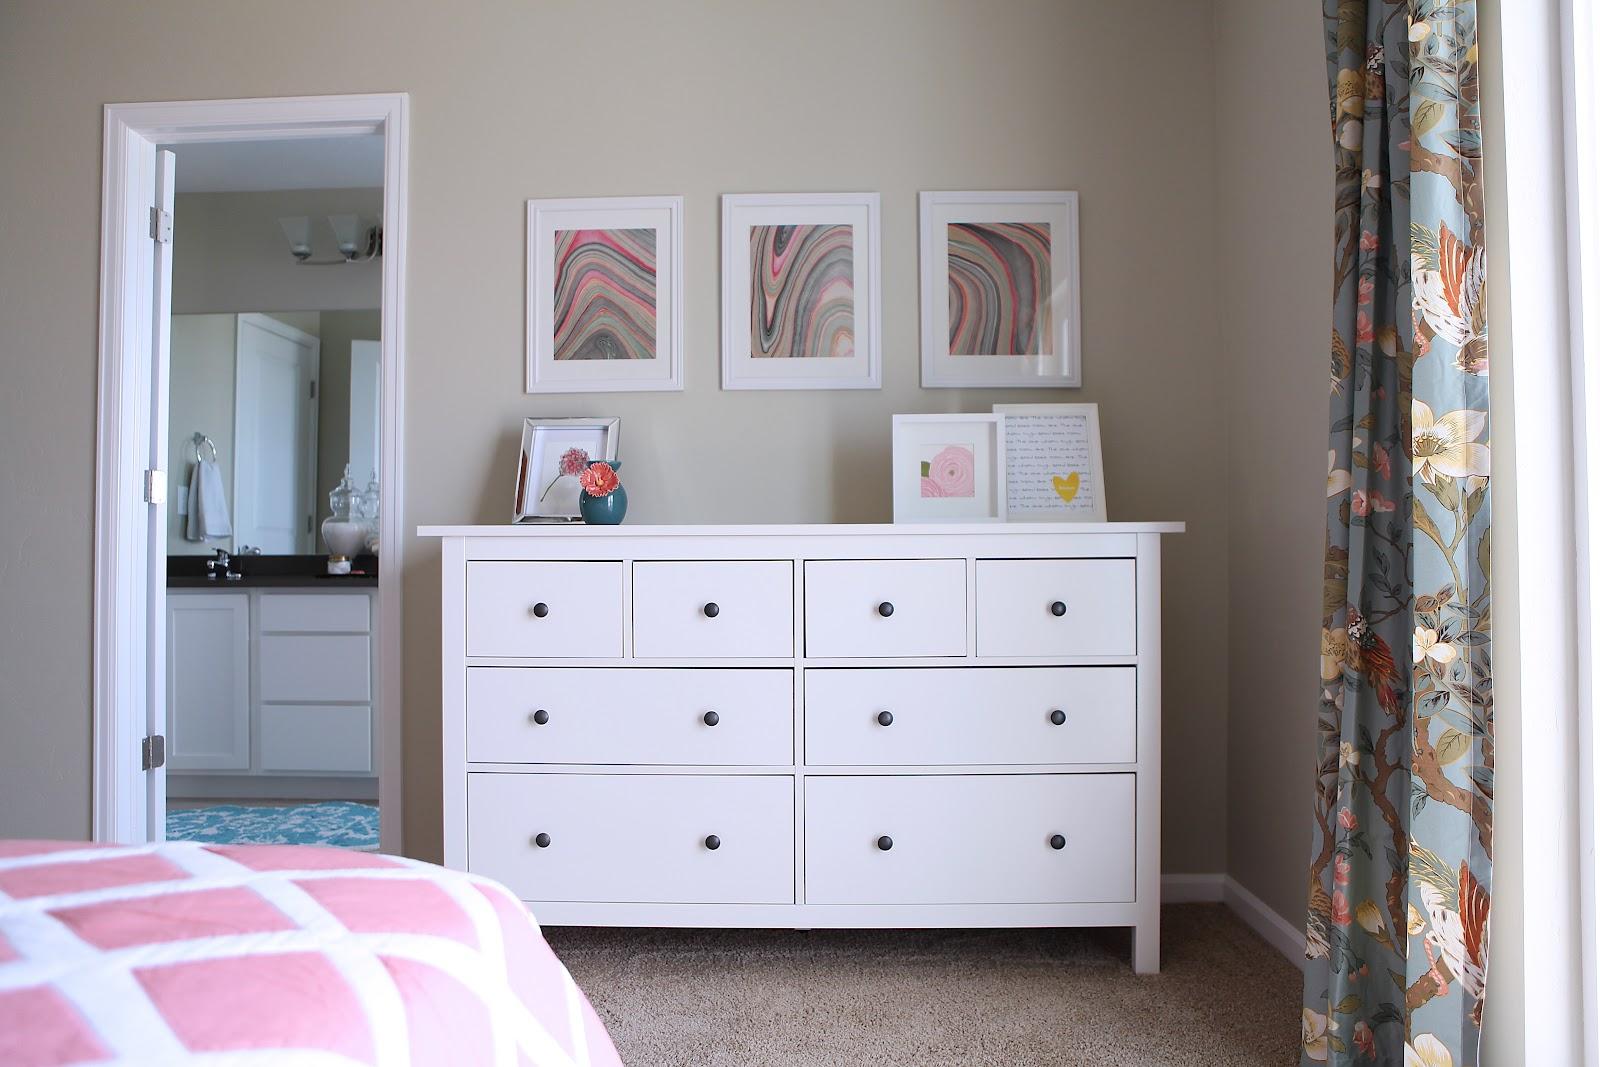 ikea white hemnes bedroom furniture photo - 3